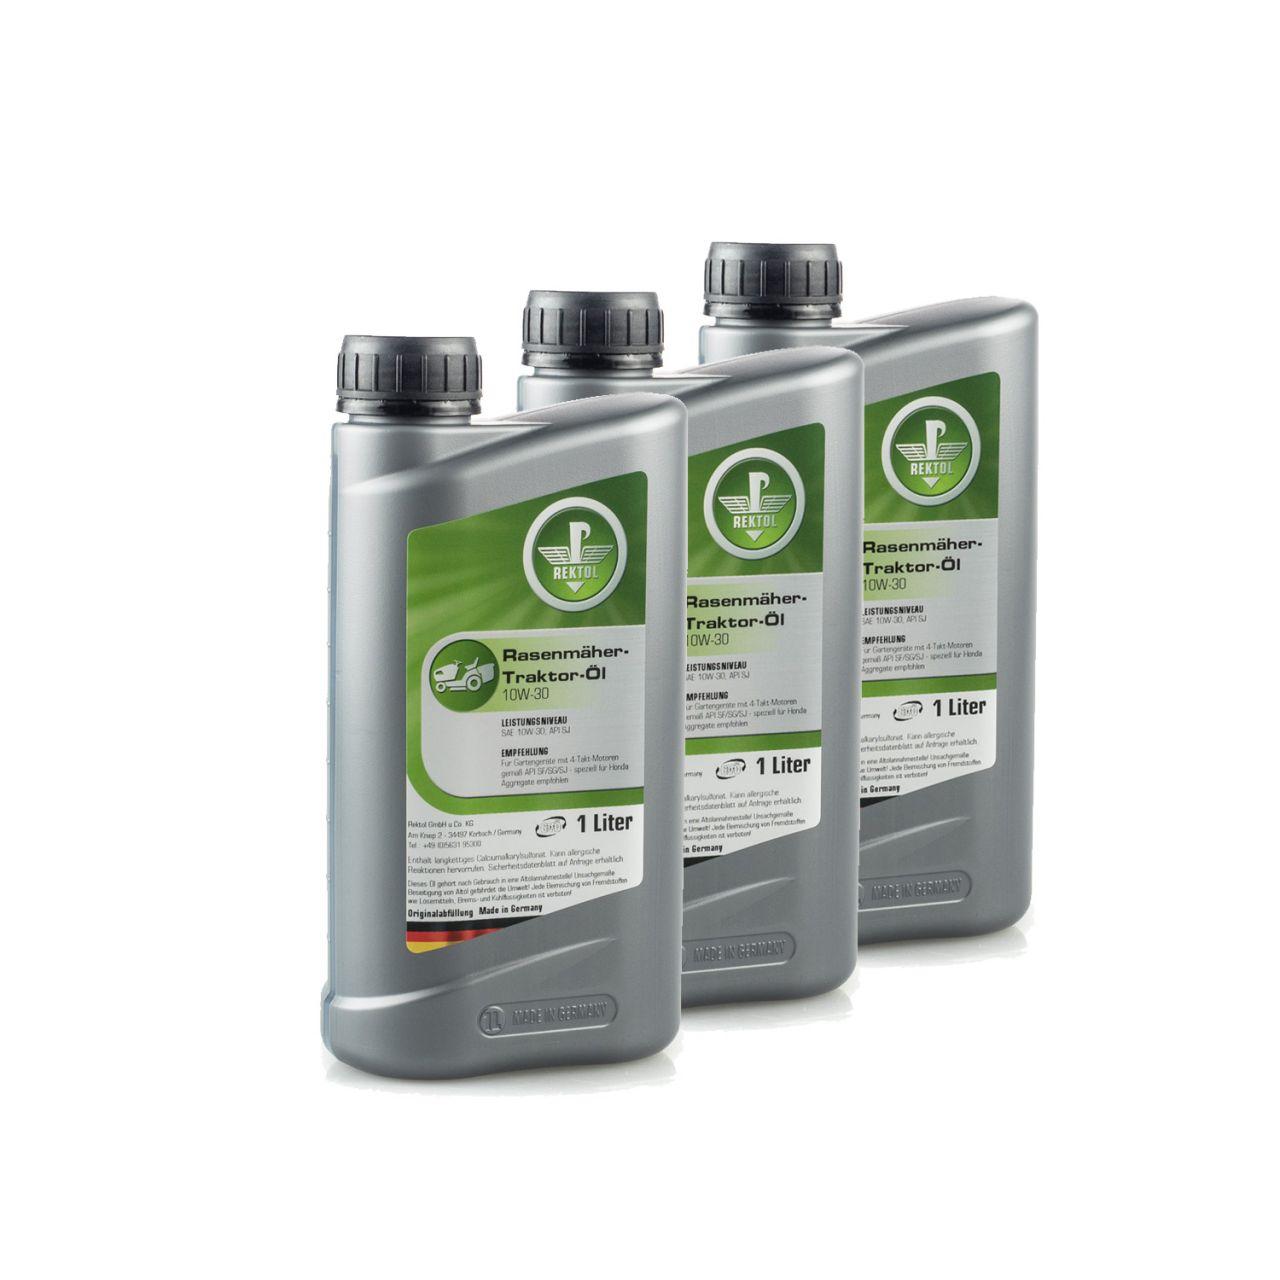 Rektol Rasenmäher & Rasentraktor Öl 10W30 (3x 1 Liter) RK_001